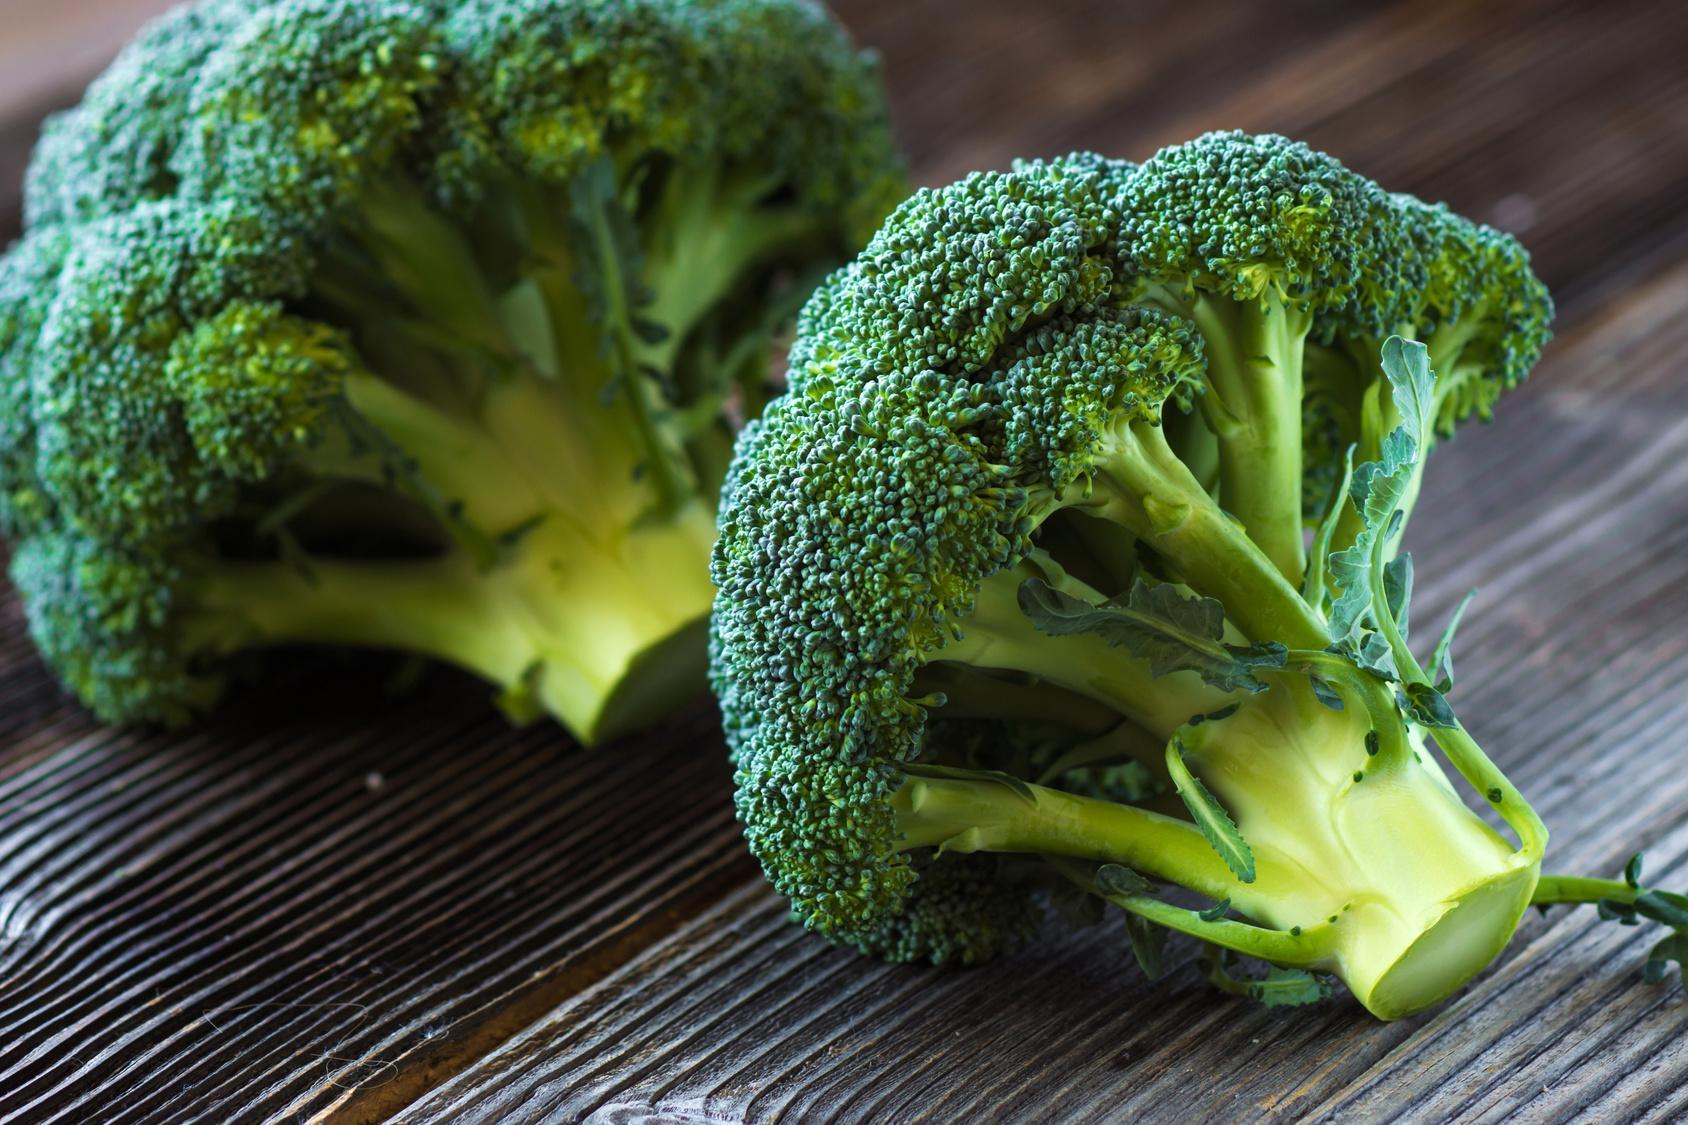 recettes brocoli cuisine madame figaro